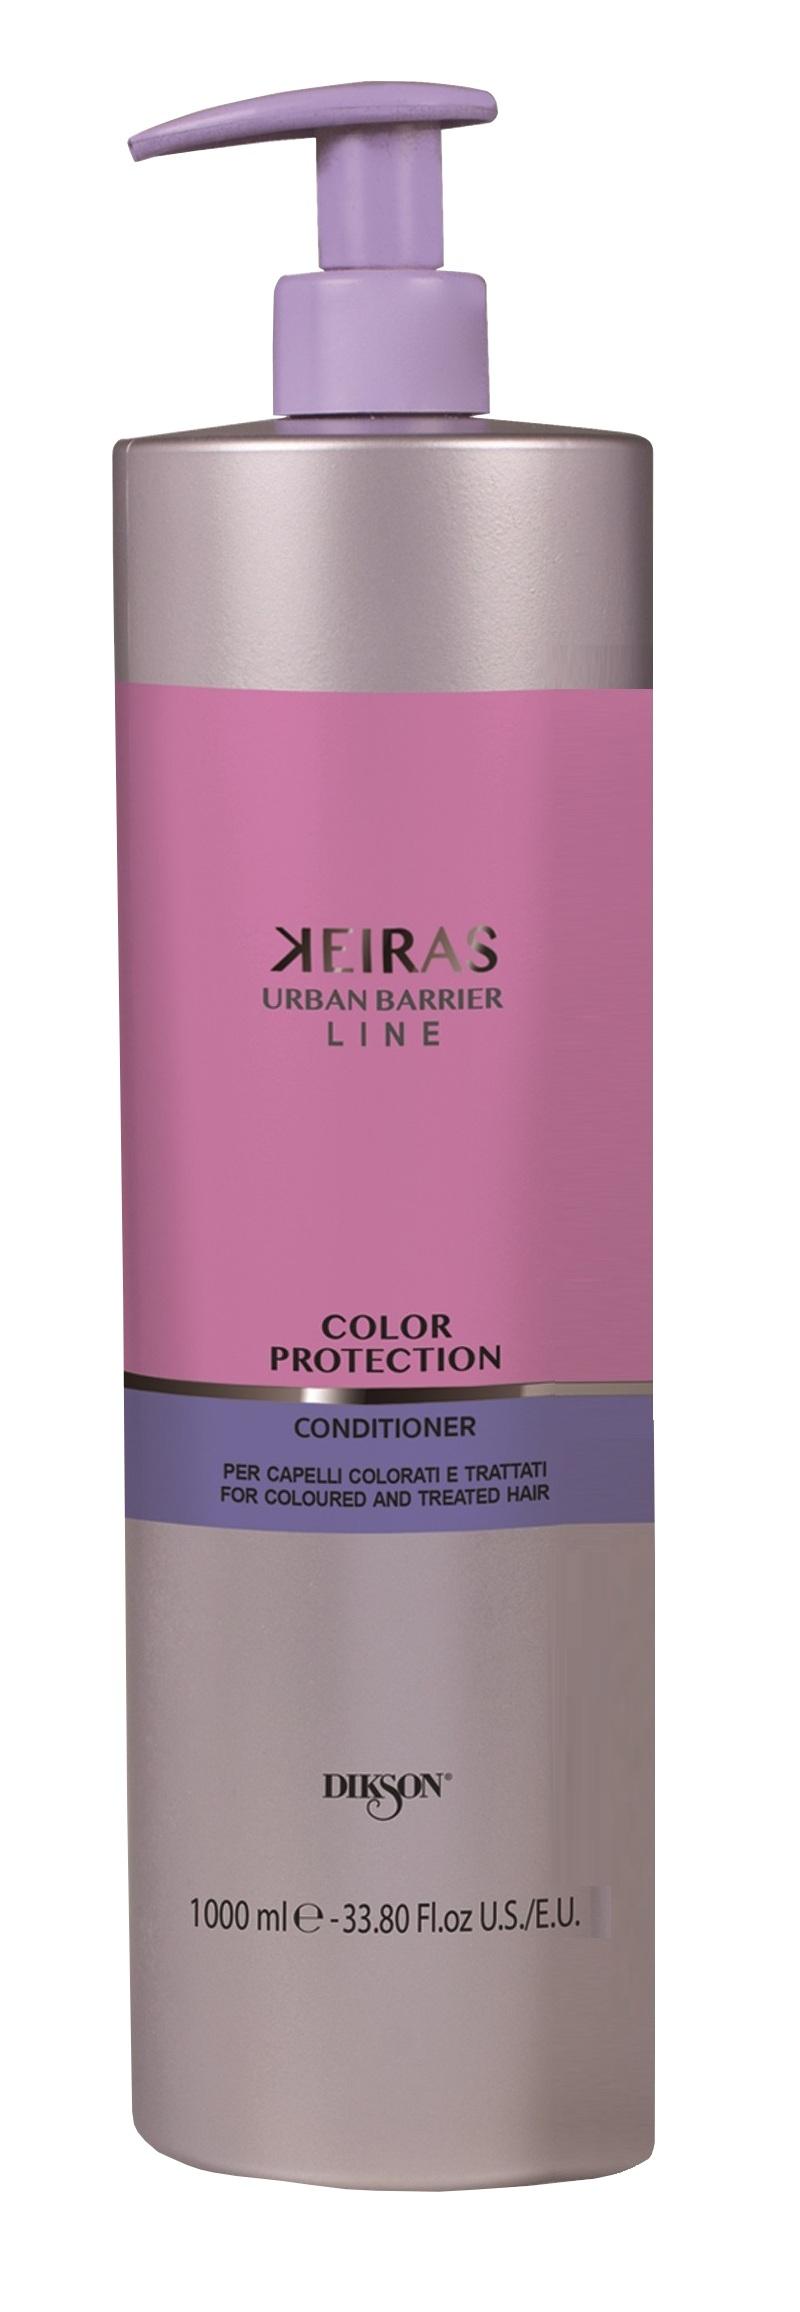 Купить DIKSON Кондиционер для окрашенных волос / KEIRAS CONDITIONER FOR COLOURED AND TREATED HAIR 1000 мл